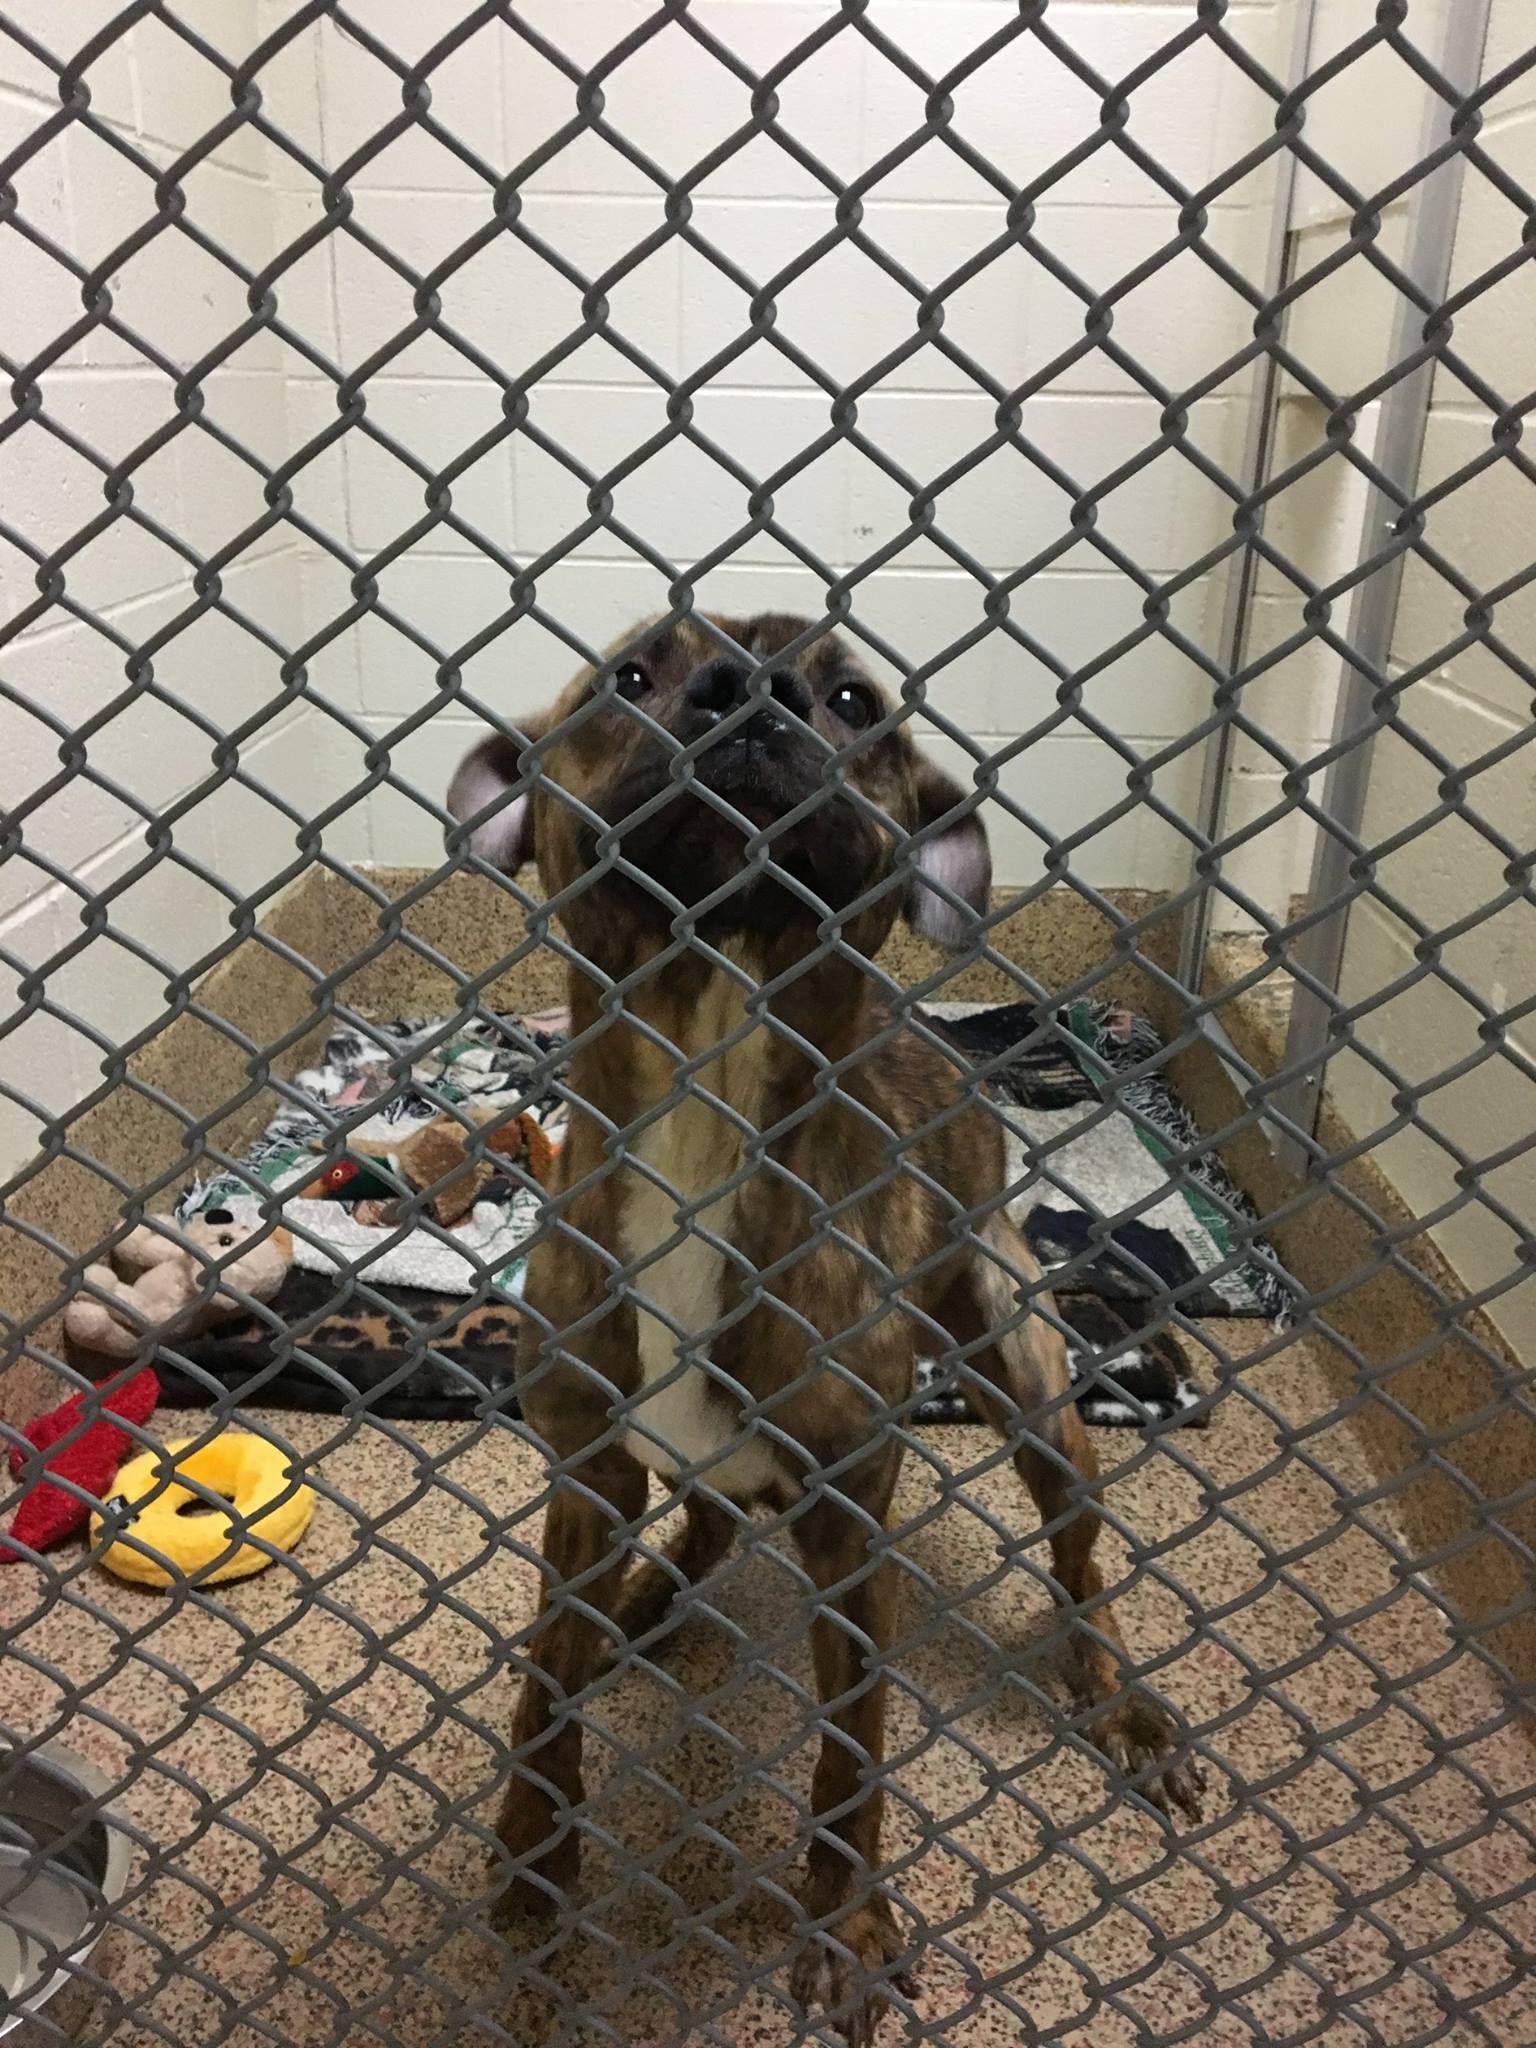 Thomas J. O'Connor Animal Control and Adoption Center Page